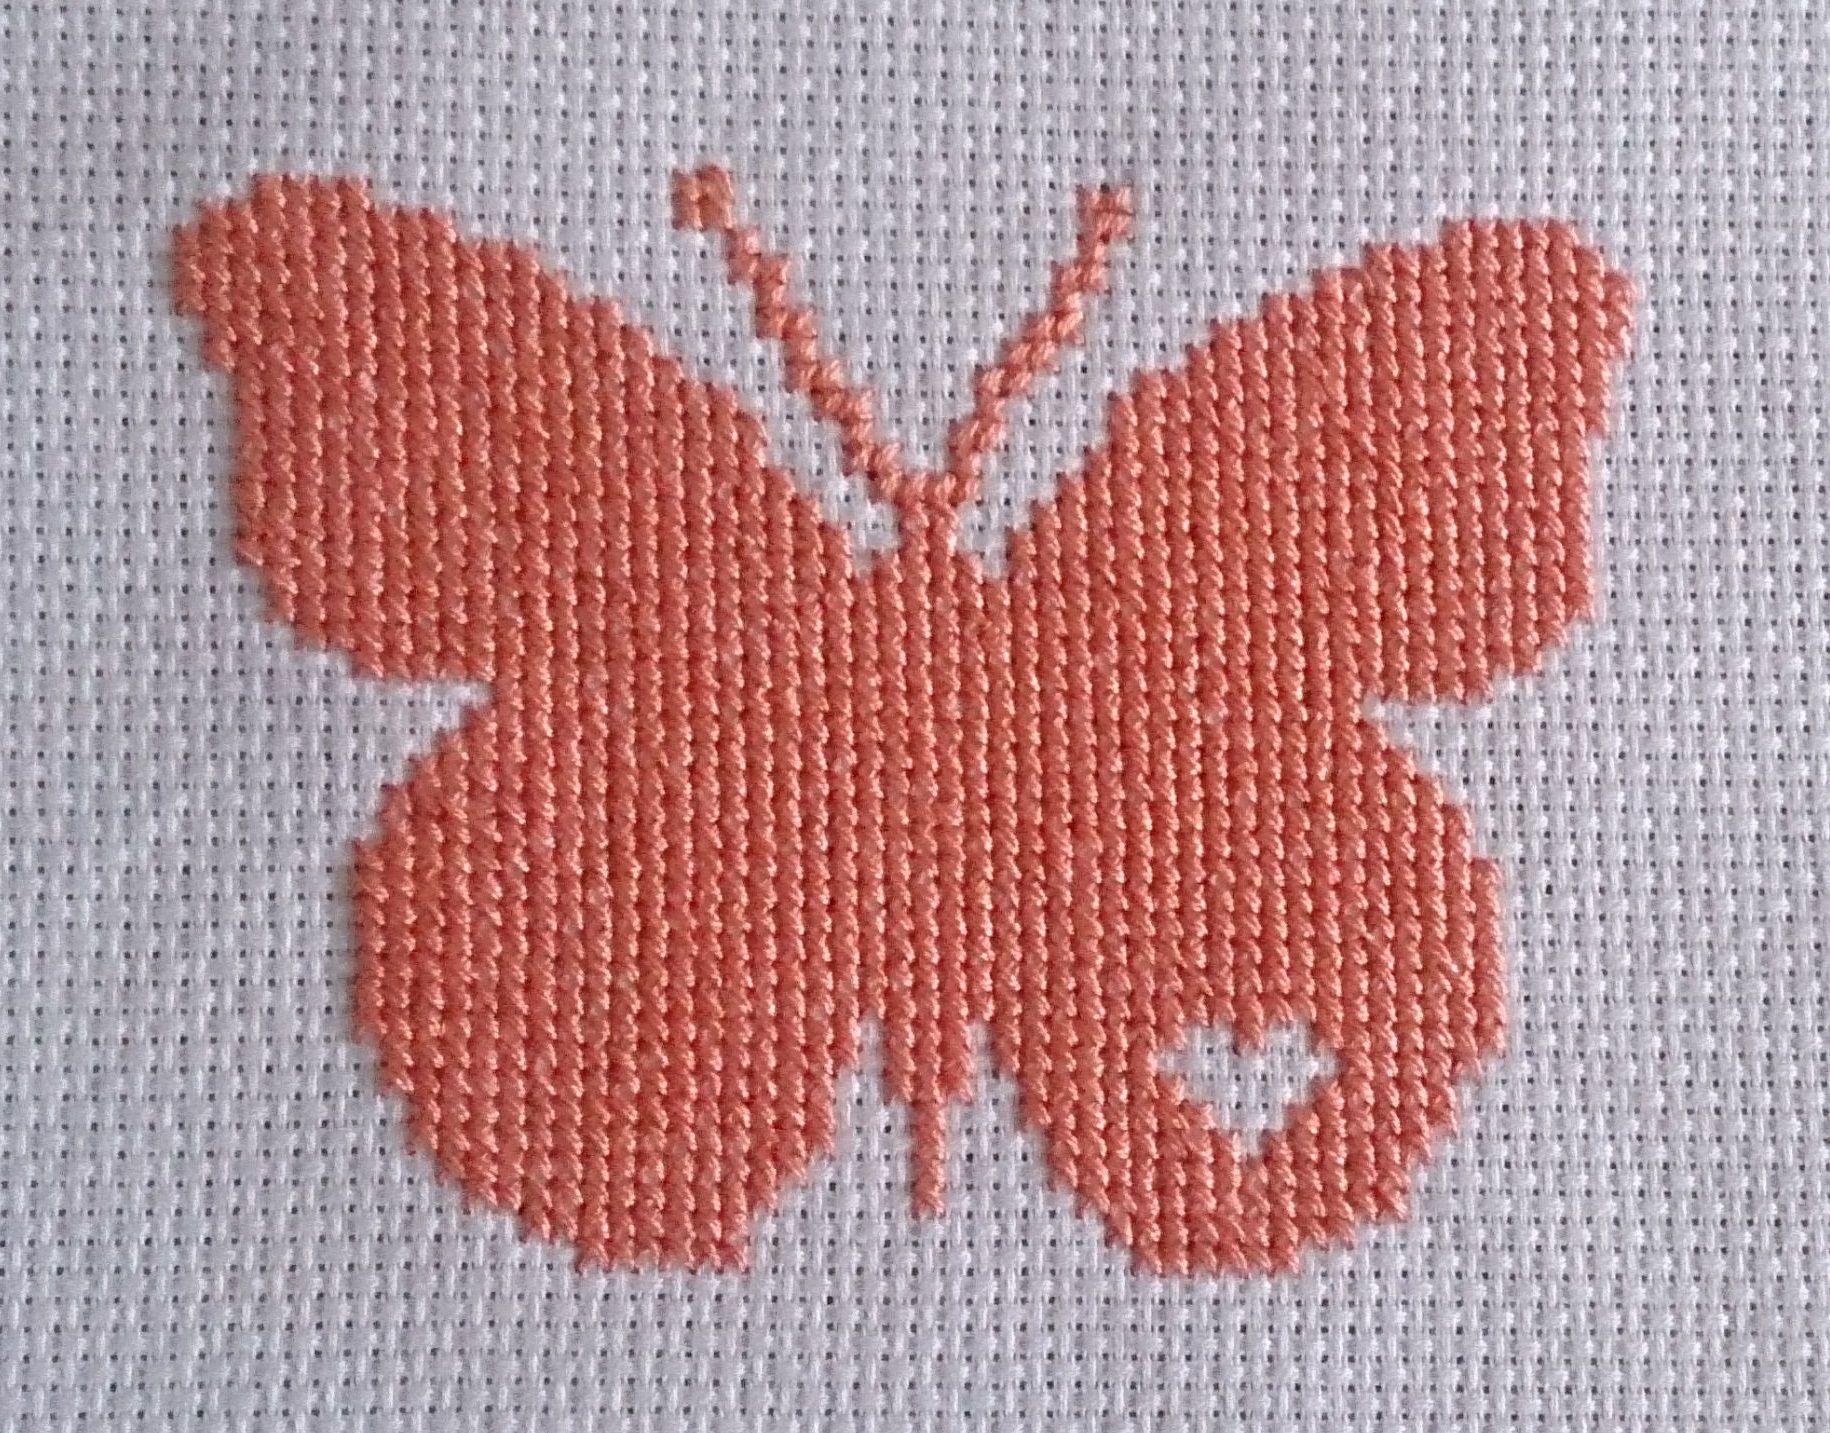 Dibujo de Mariposa bordado a punto de cruz en color Naranja